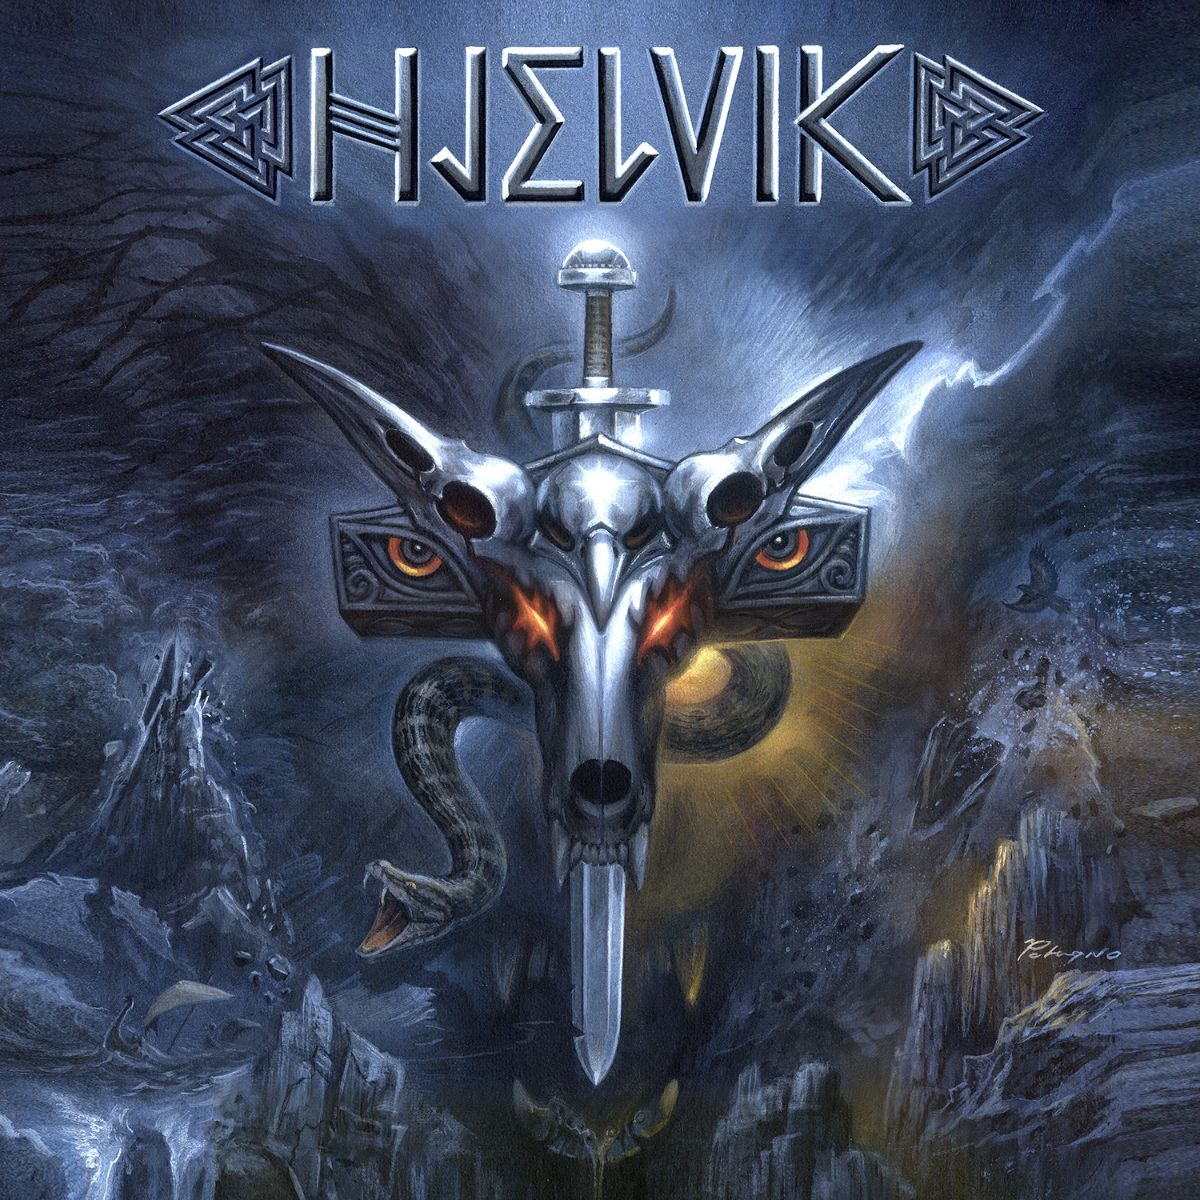 hjelvik welcome to hel